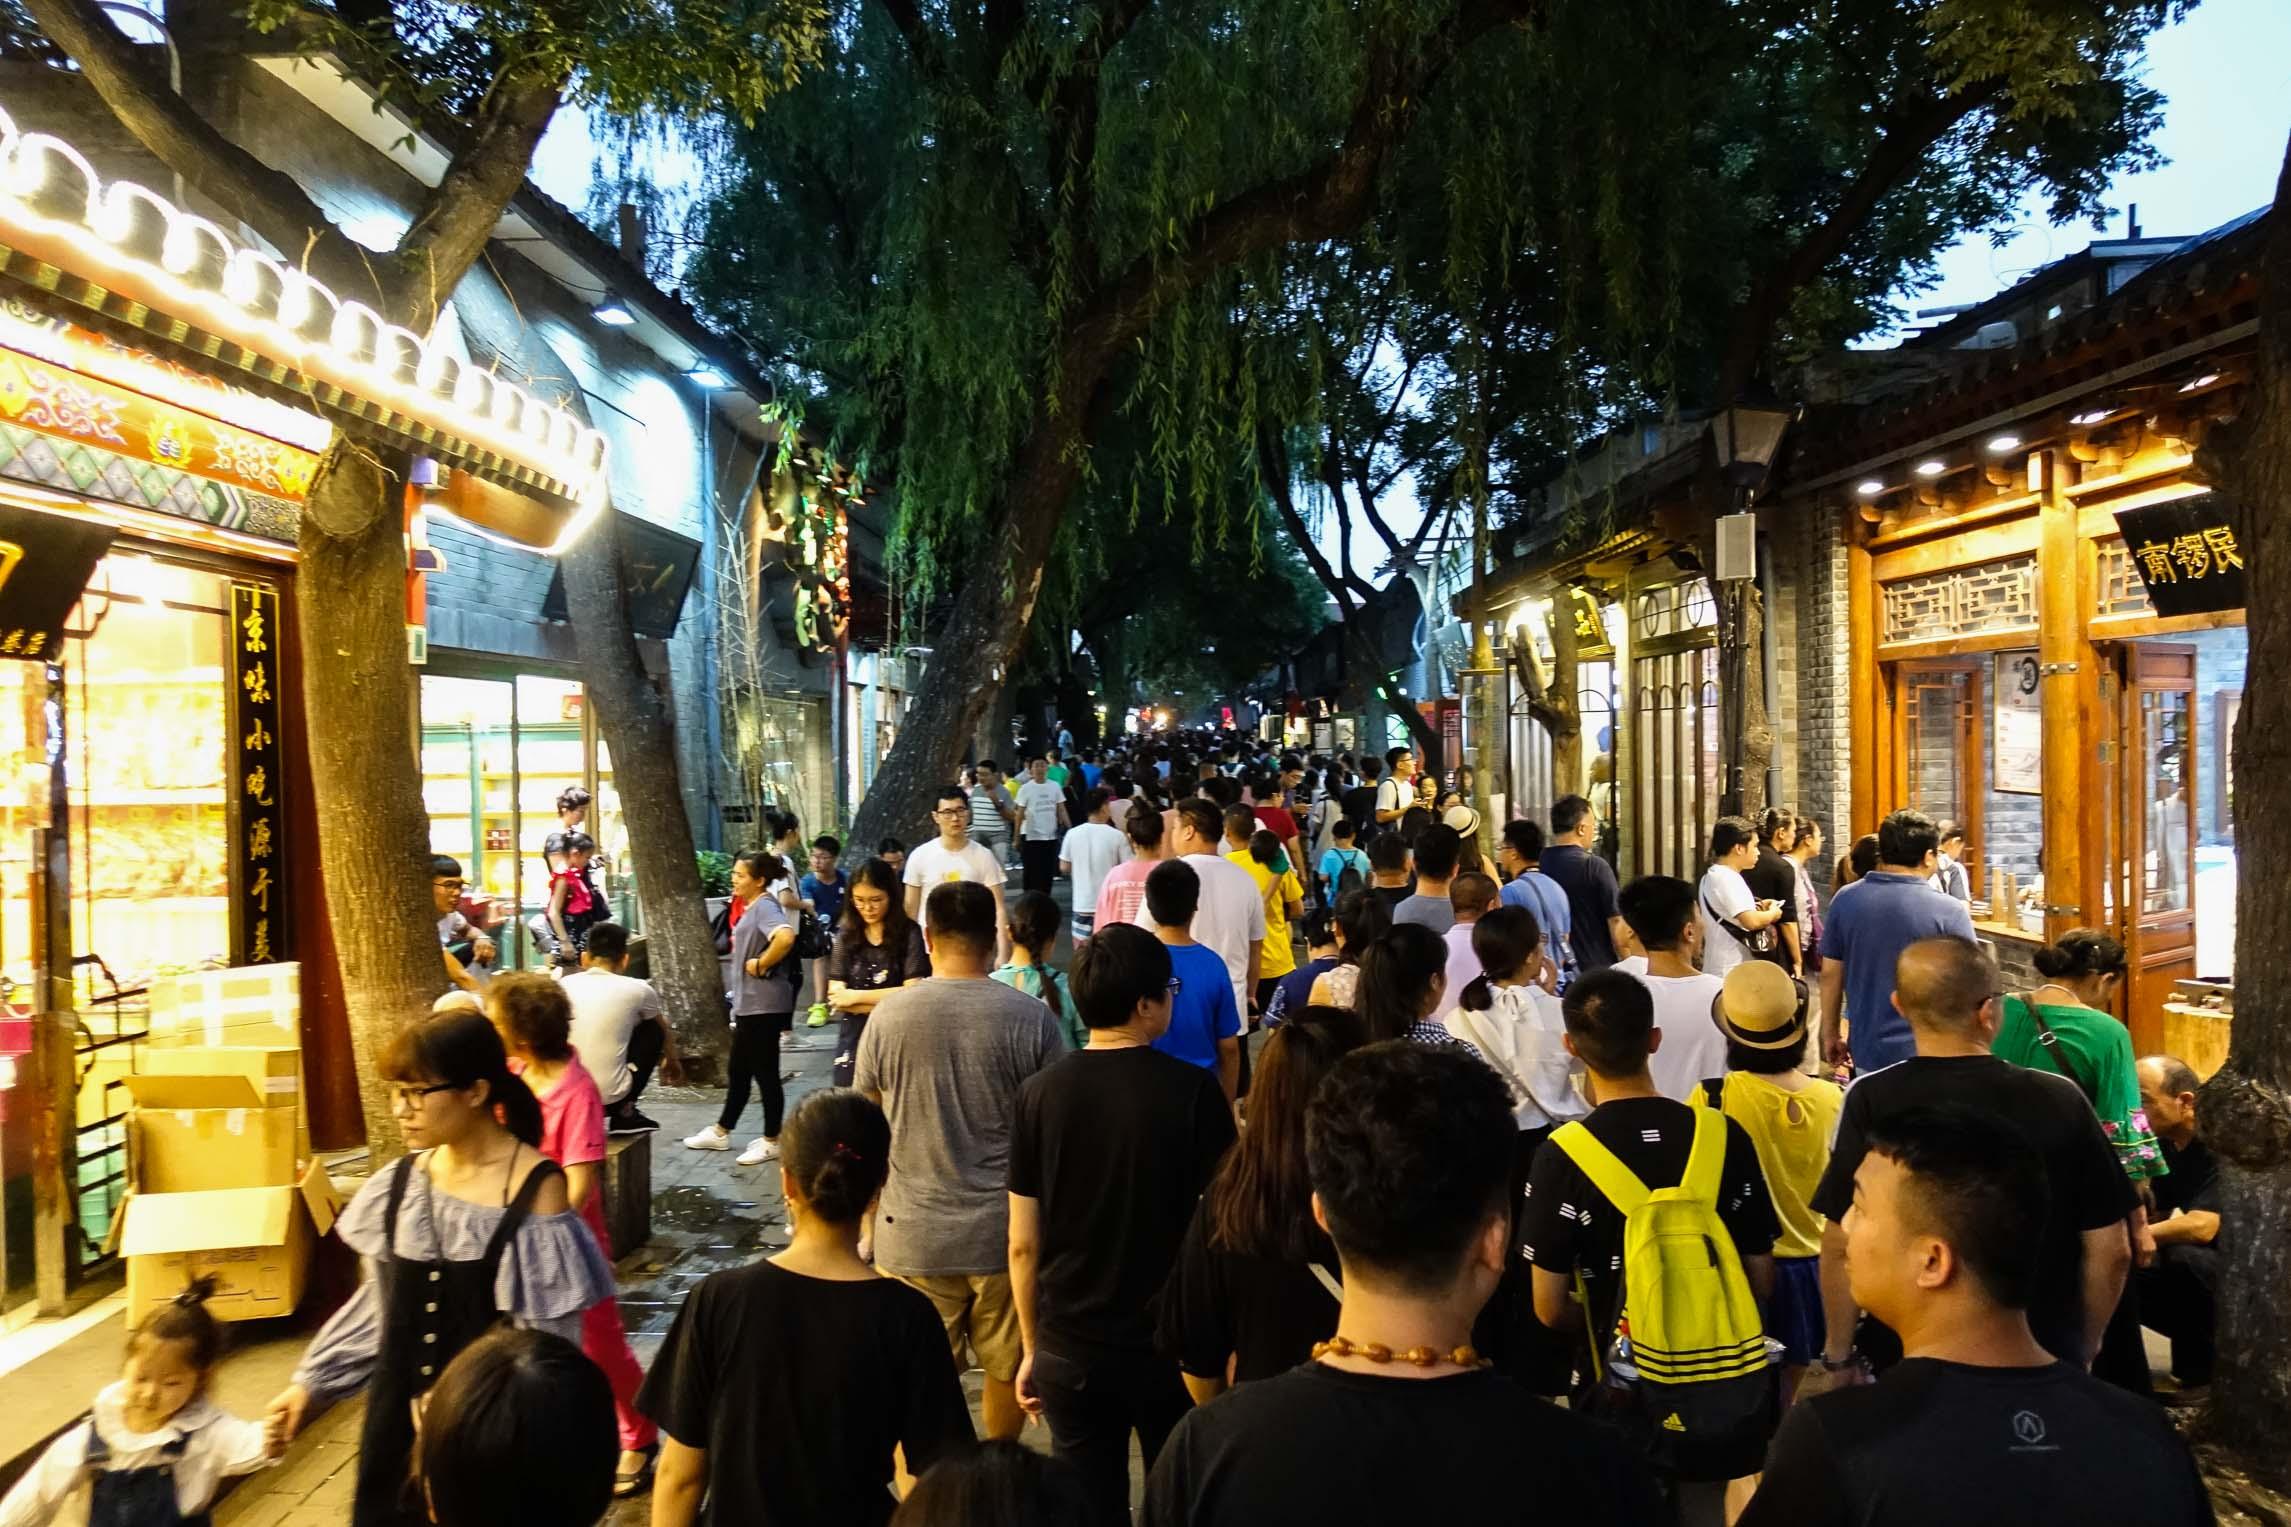 Busy street food street